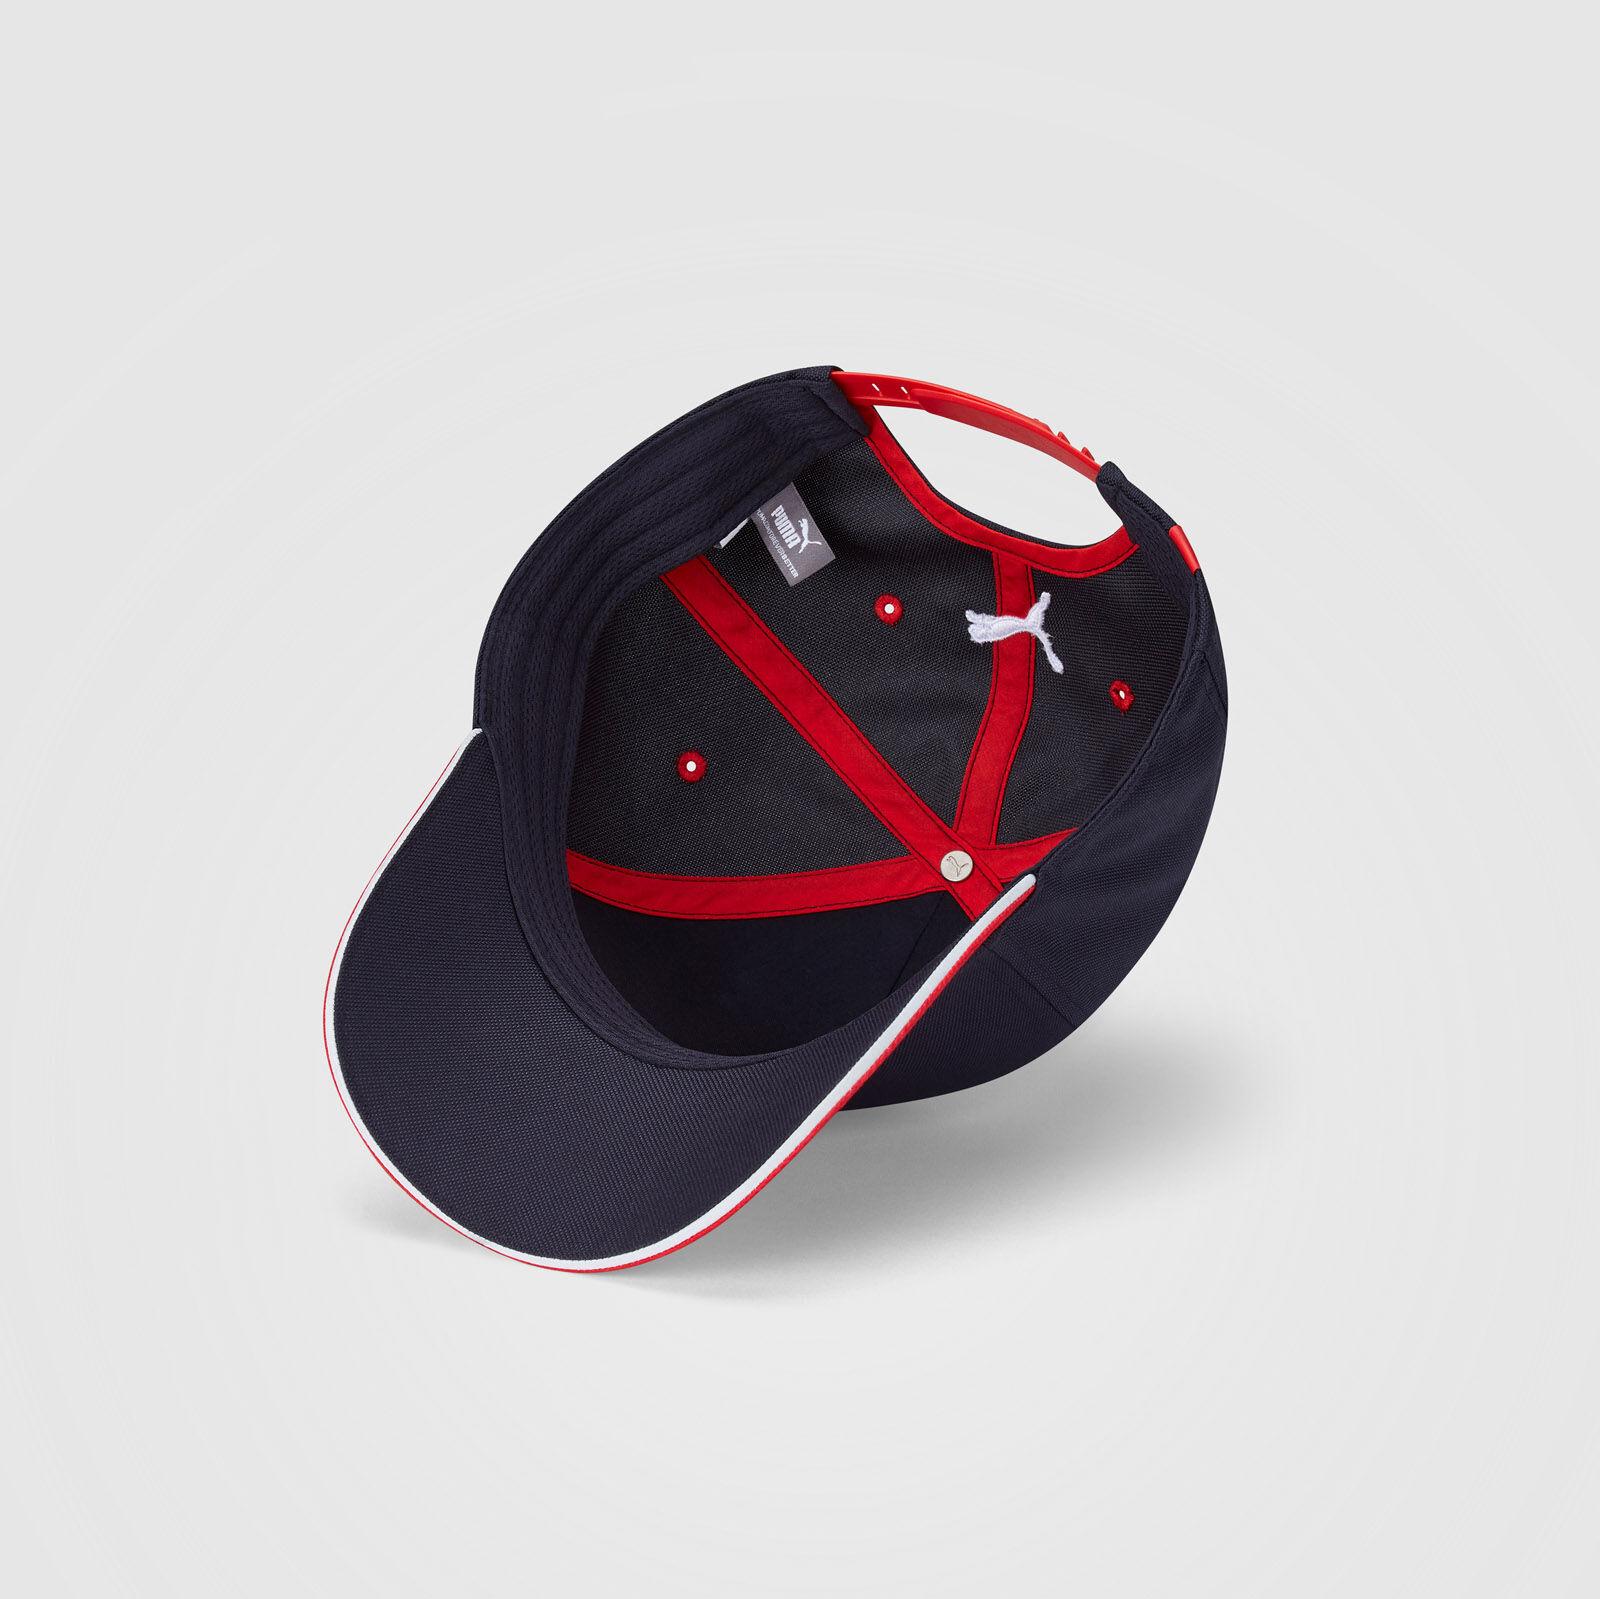 Fuel For Fans Formel 1 Unisex-Erwachsene 2020 Team Cap